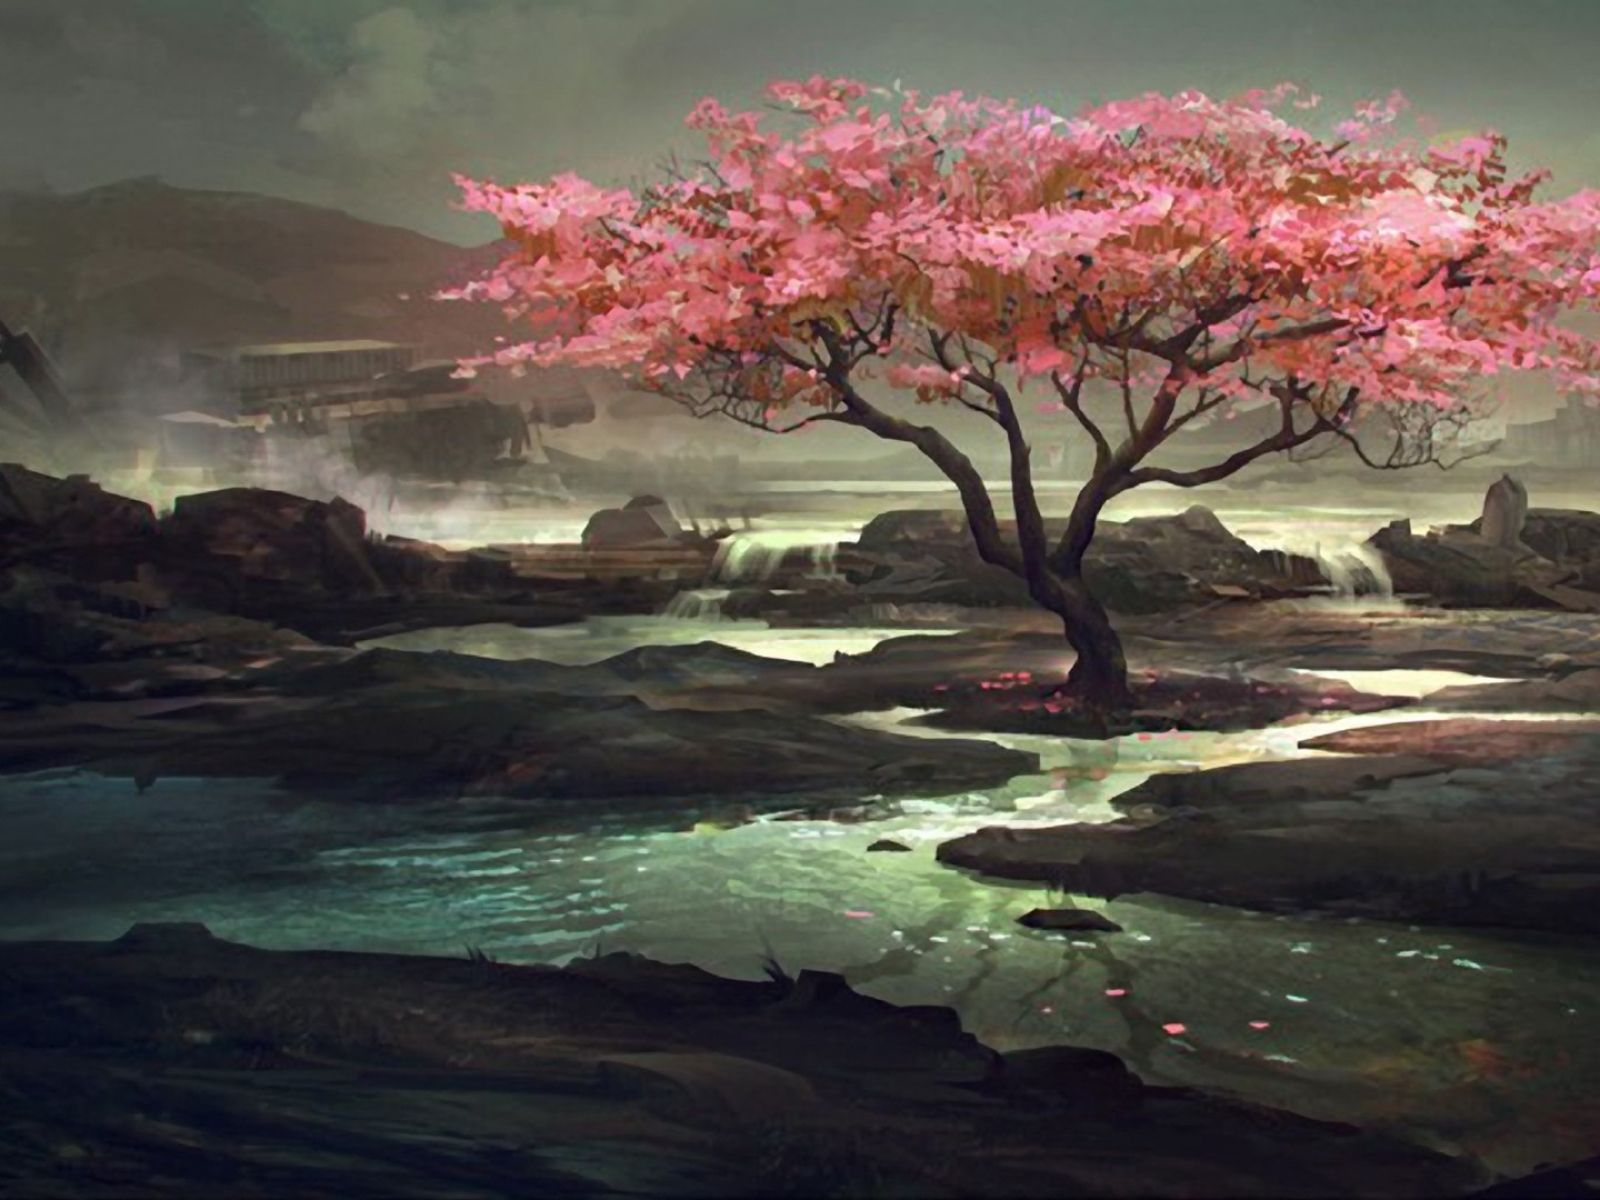 Water Fantasy Mountains Clouds Landscapes Cherry Blossoms Trees Fantasy Art Landscapes Sakura Art Tree Art